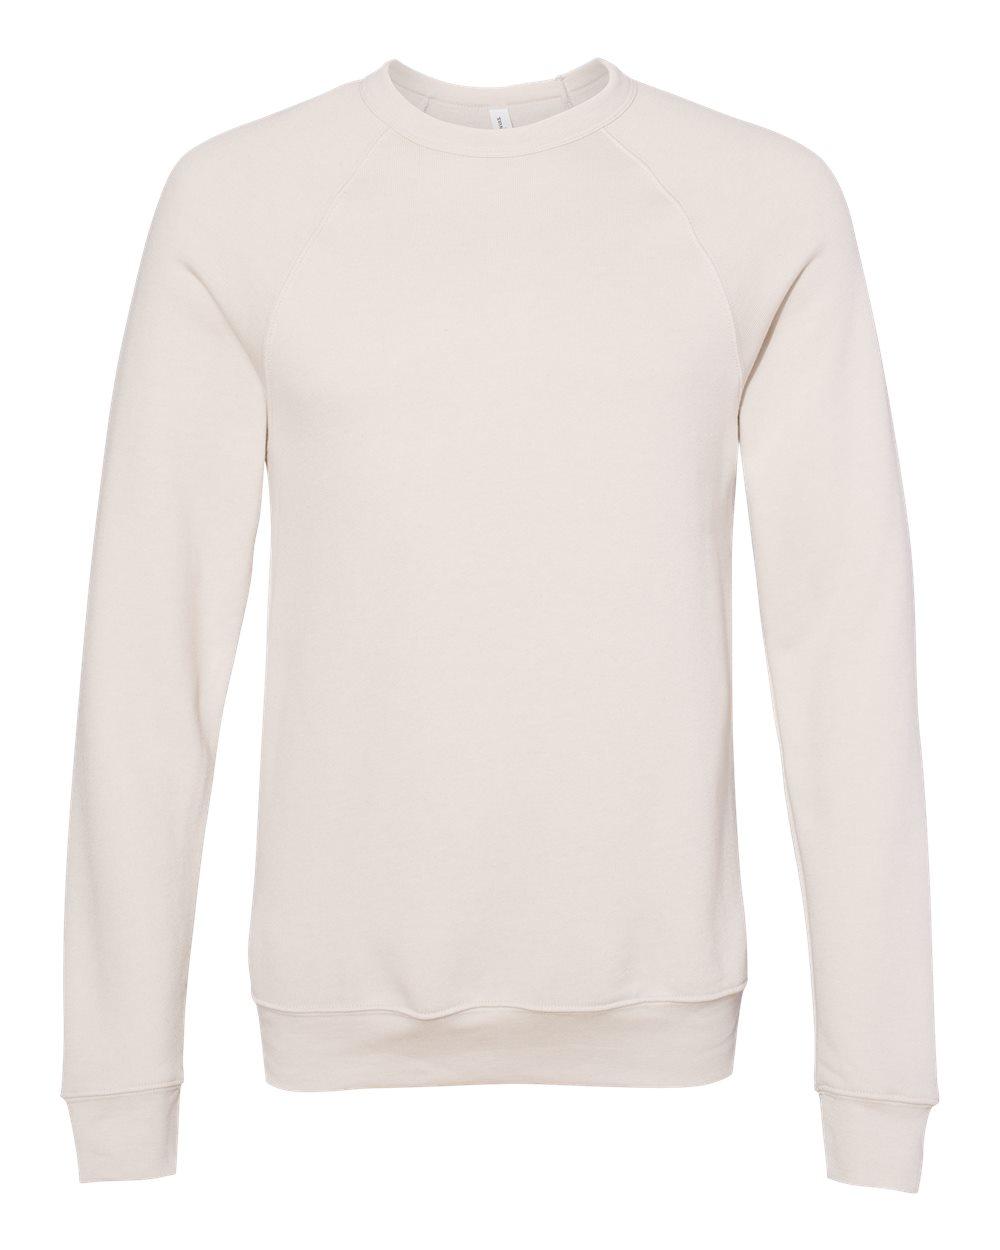 Bella-Canvas-Unisex-Sponge-Fleece-Crewneck-Sweatshirt-Top-Blank-3901-up-to-2XL thumbnail 32